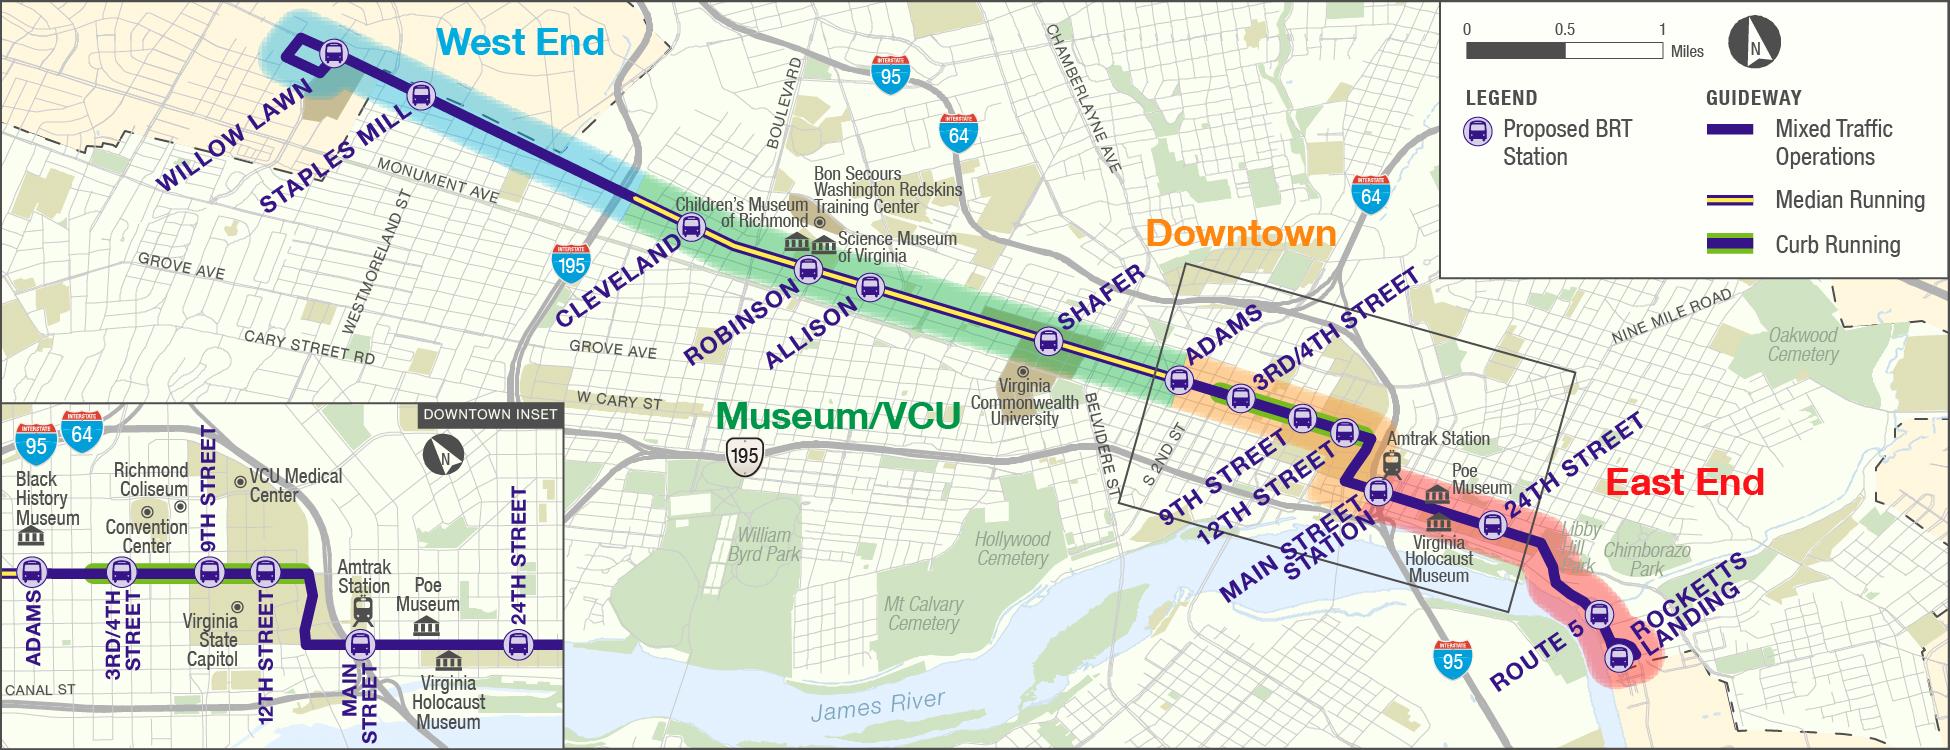 GRTC-BRT-Map-Version7-sections_-_Copy.jpg